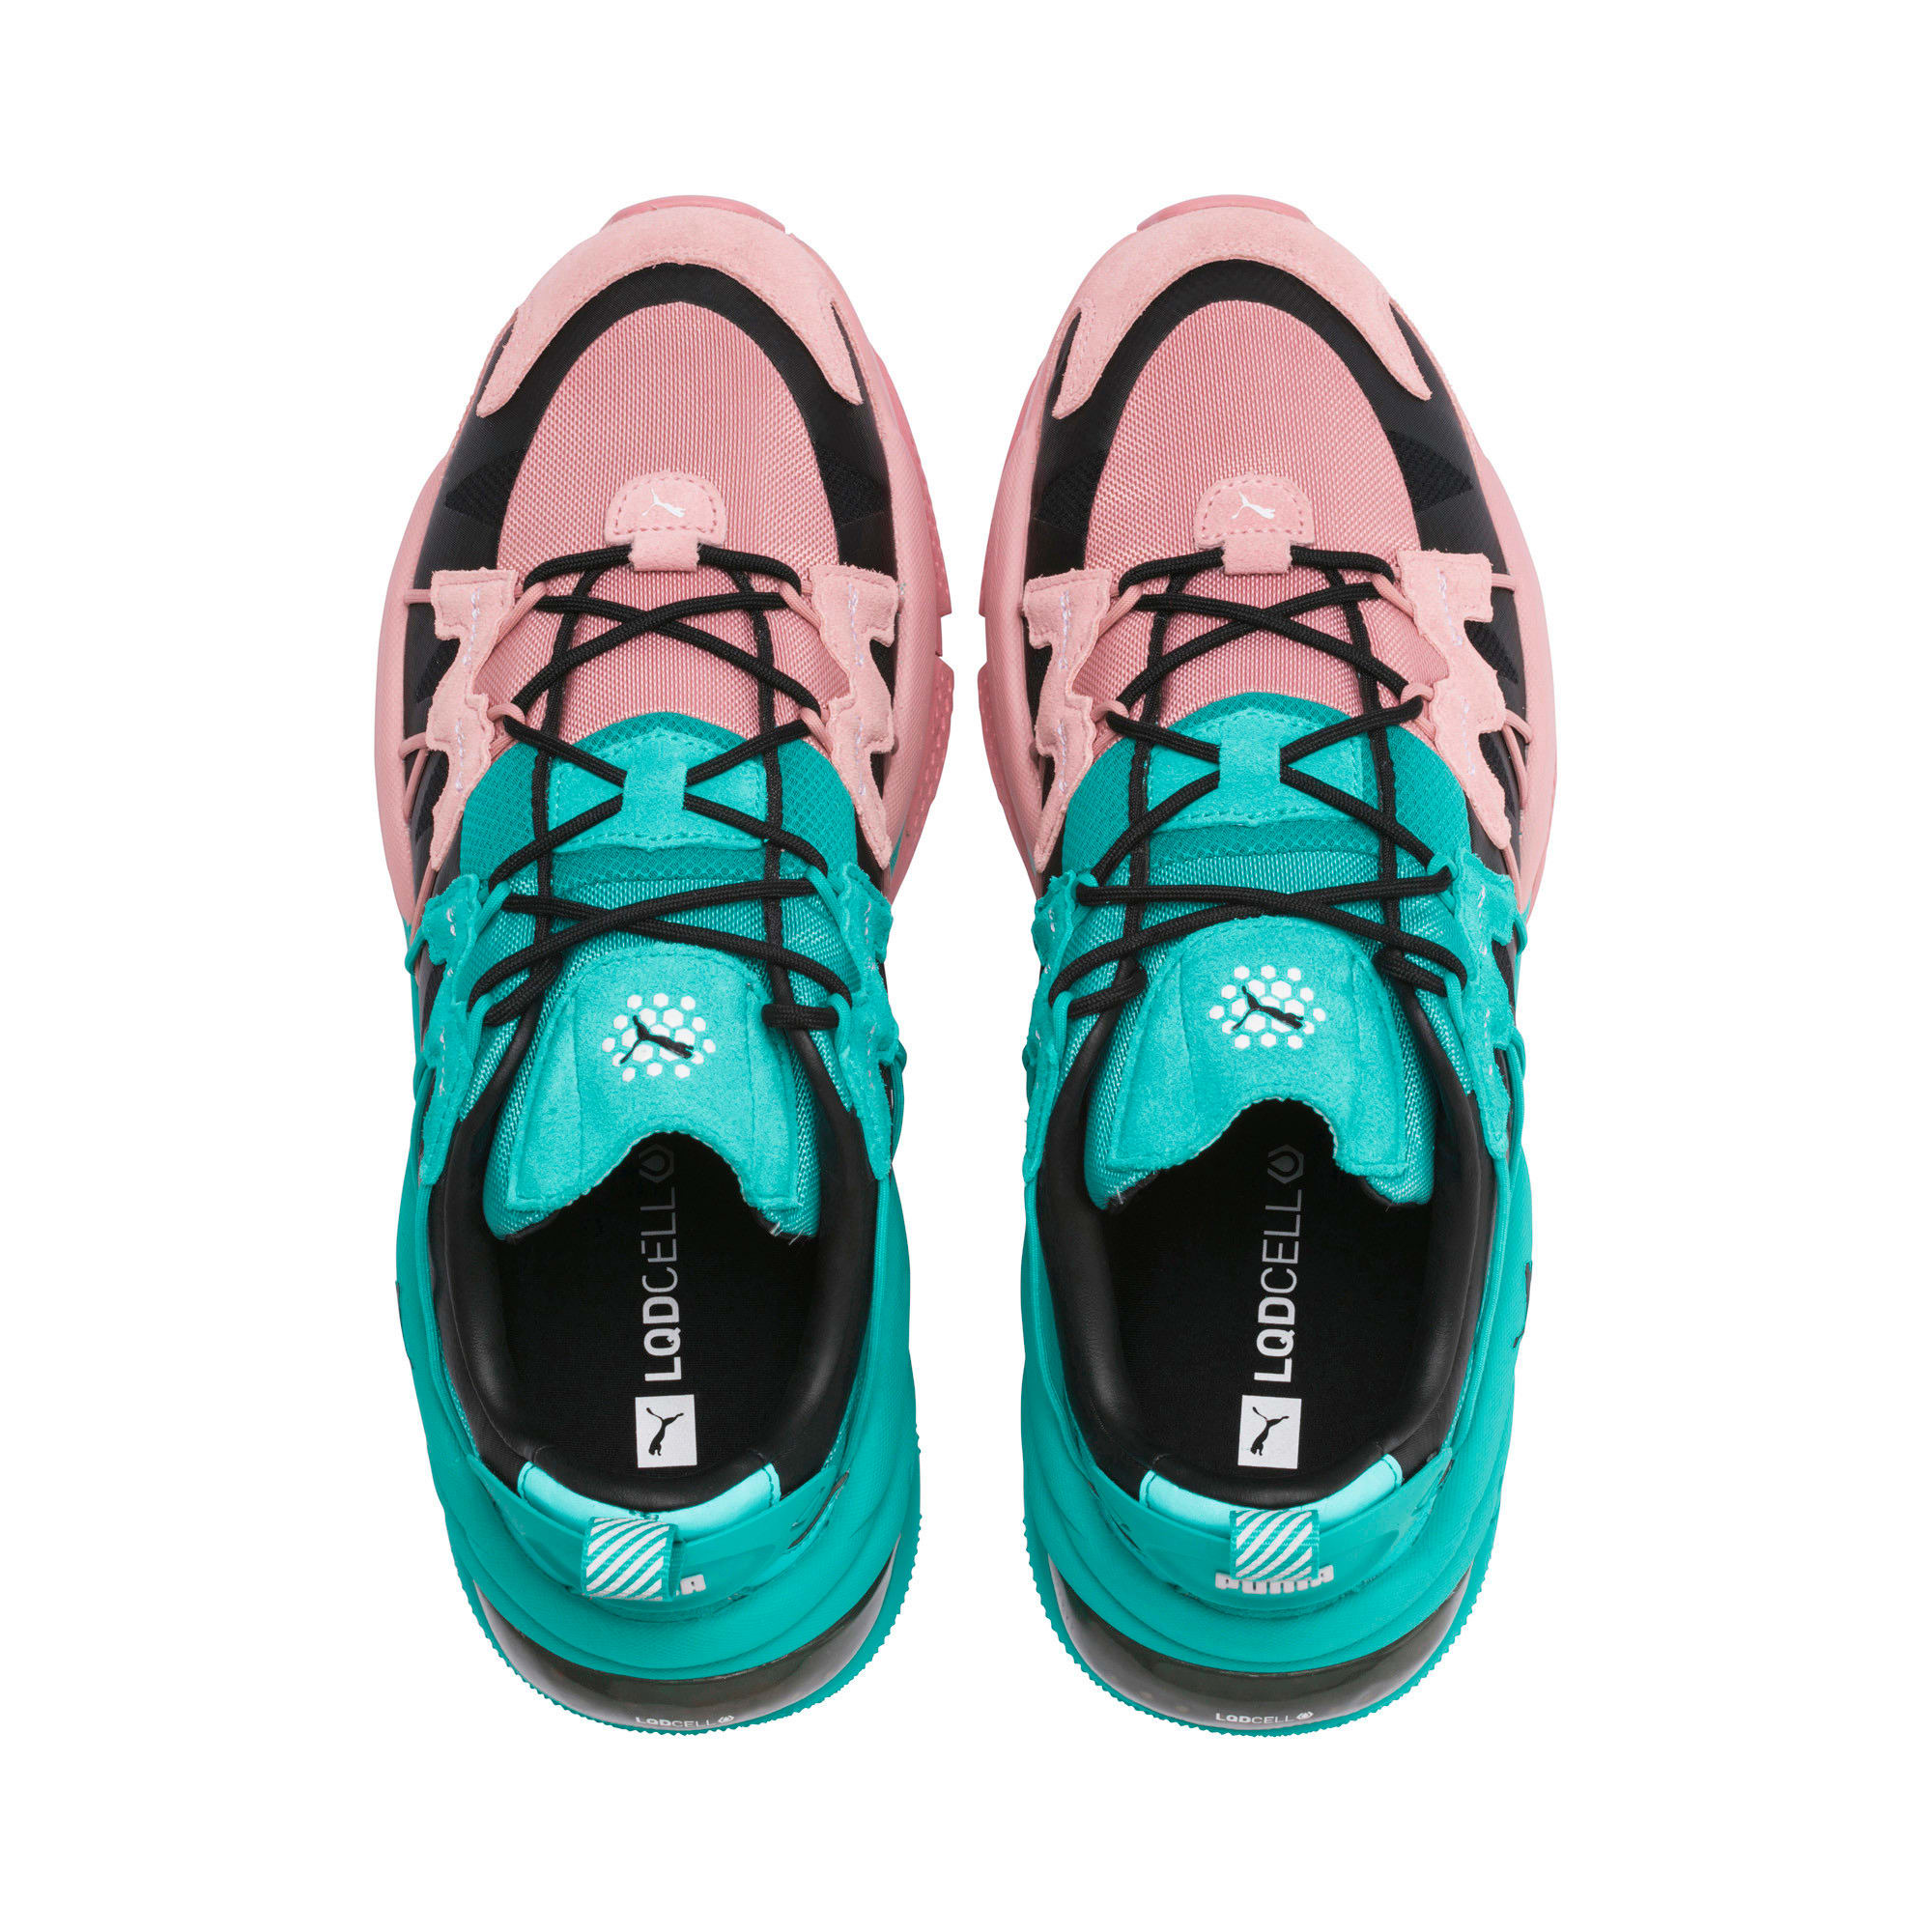 Thumbnail 6 of LQDCELL Omega Manga Cult Training Shoes, Bridal Rose-Blue Turquoise, medium